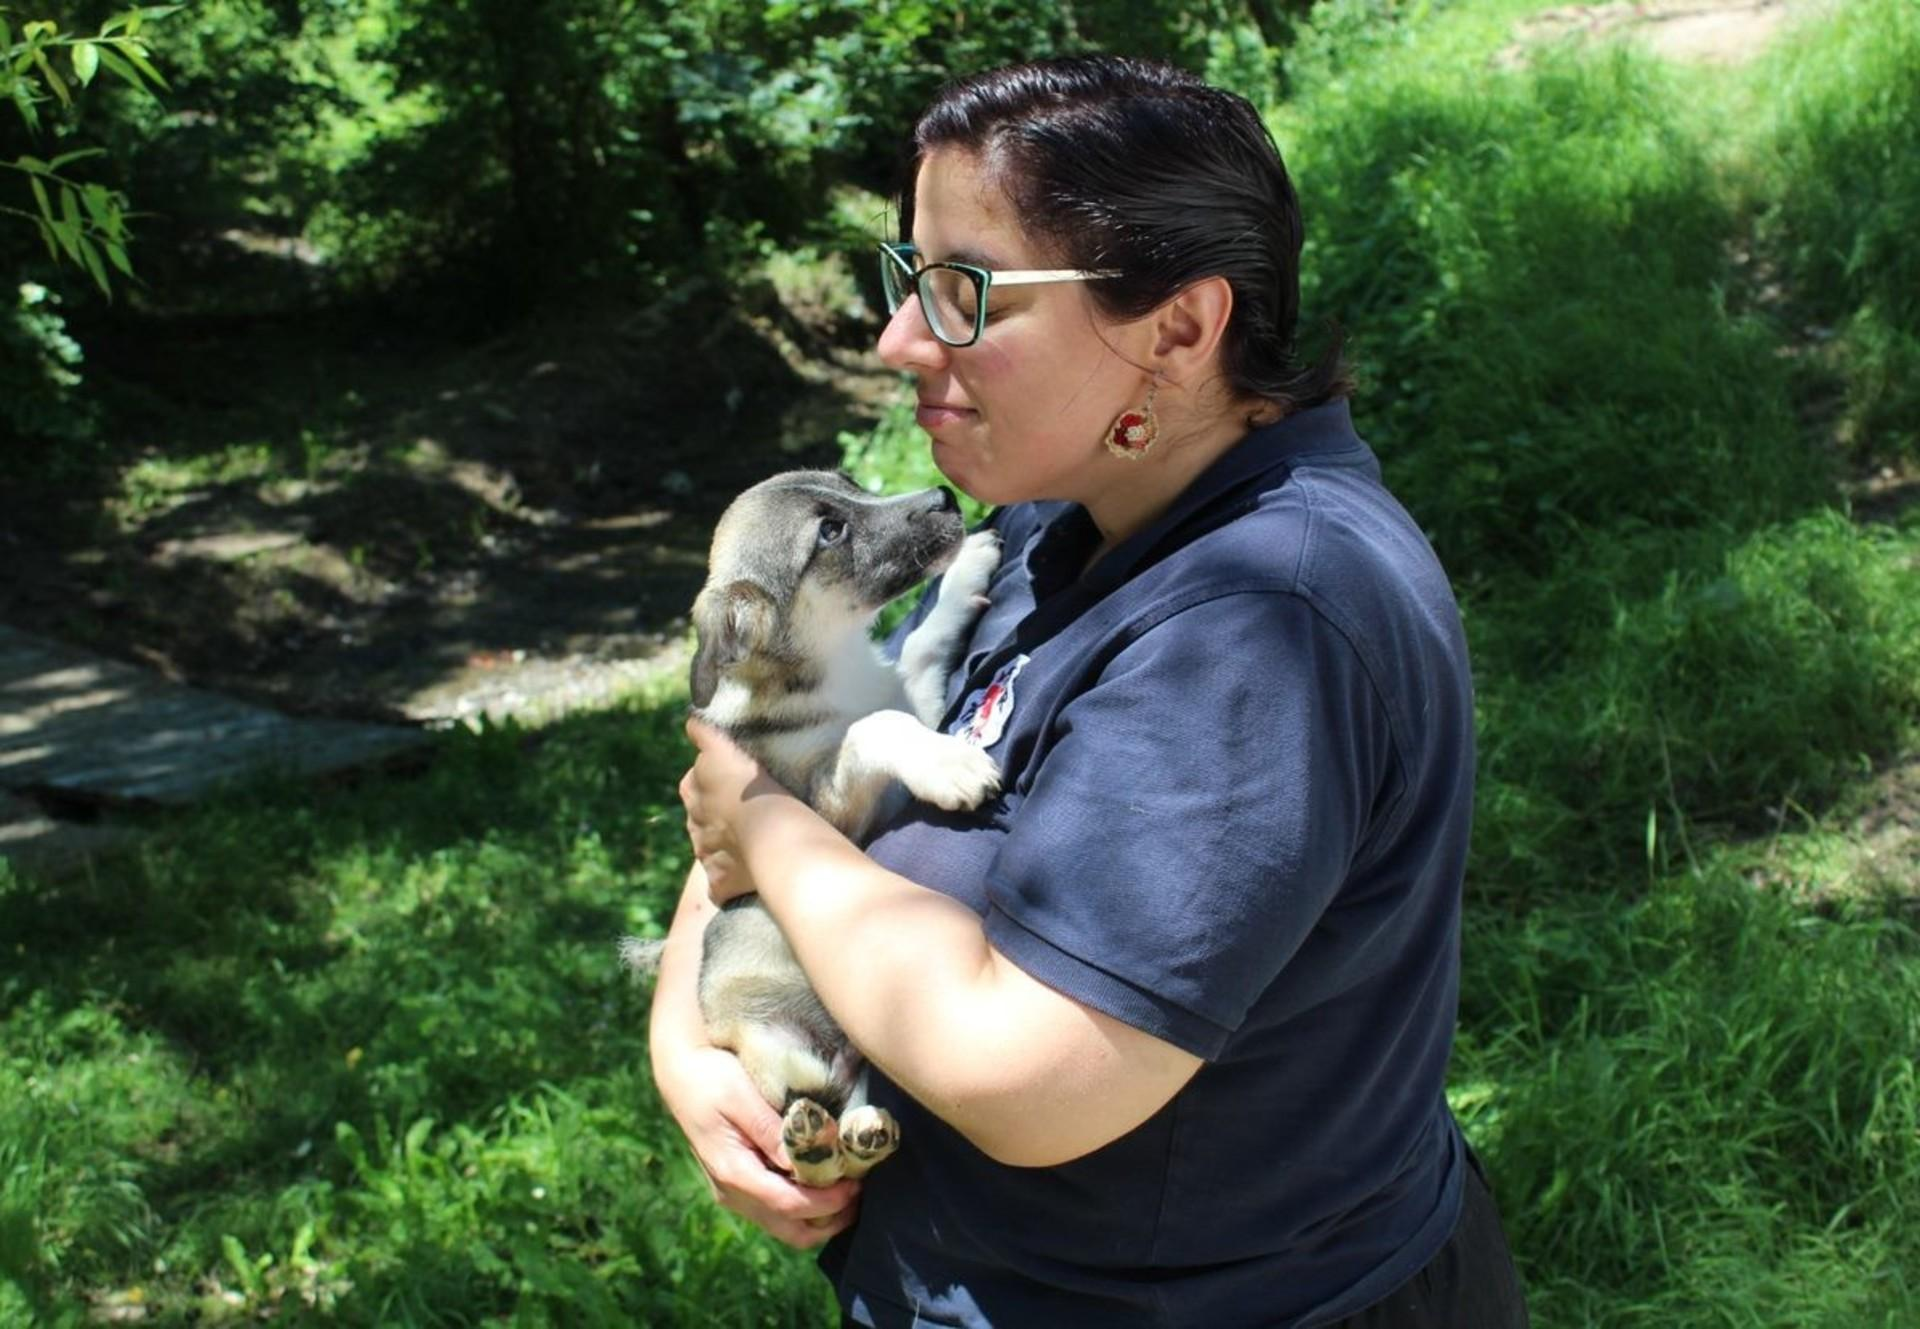 dog-woman-nature